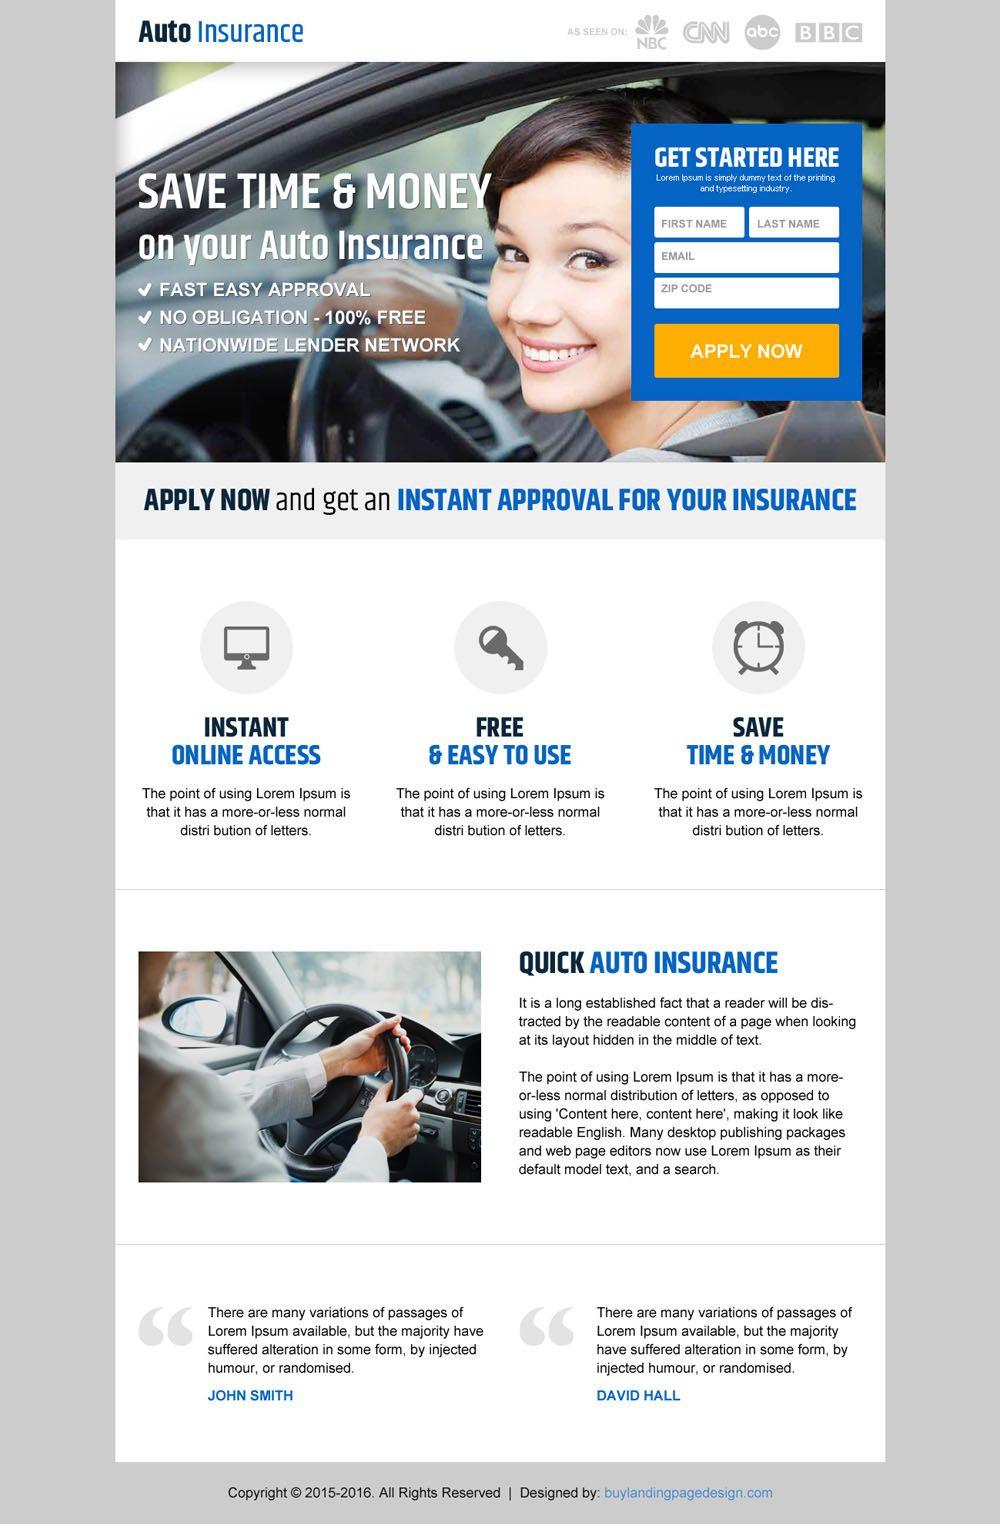 Save Money On Auto Insurance Responsive Landing Page Design Auto